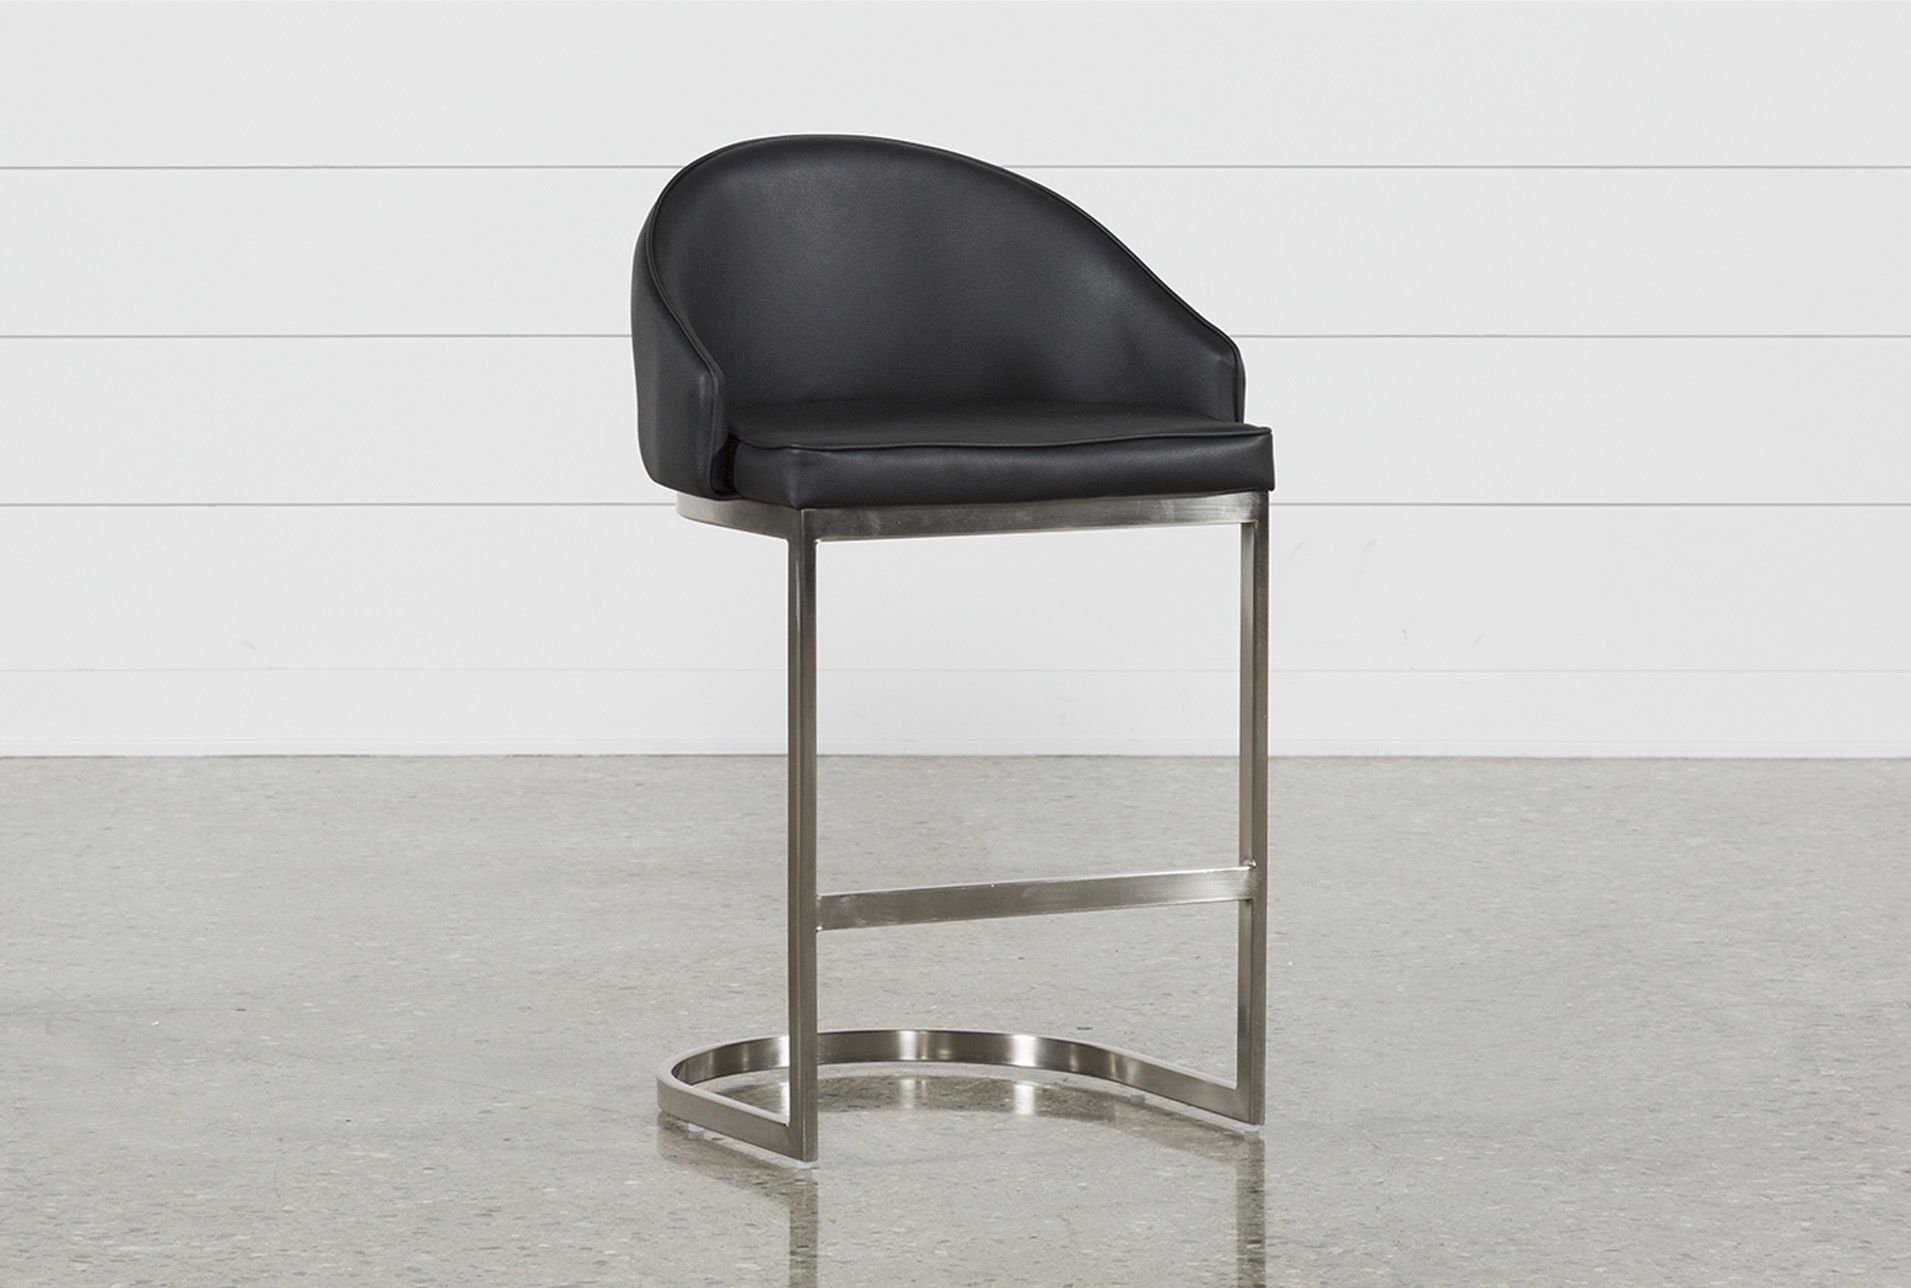 Peachy Karina Ii 24 Inch Counter Stool Products Counter Stools Evergreenethics Interior Chair Design Evergreenethicsorg